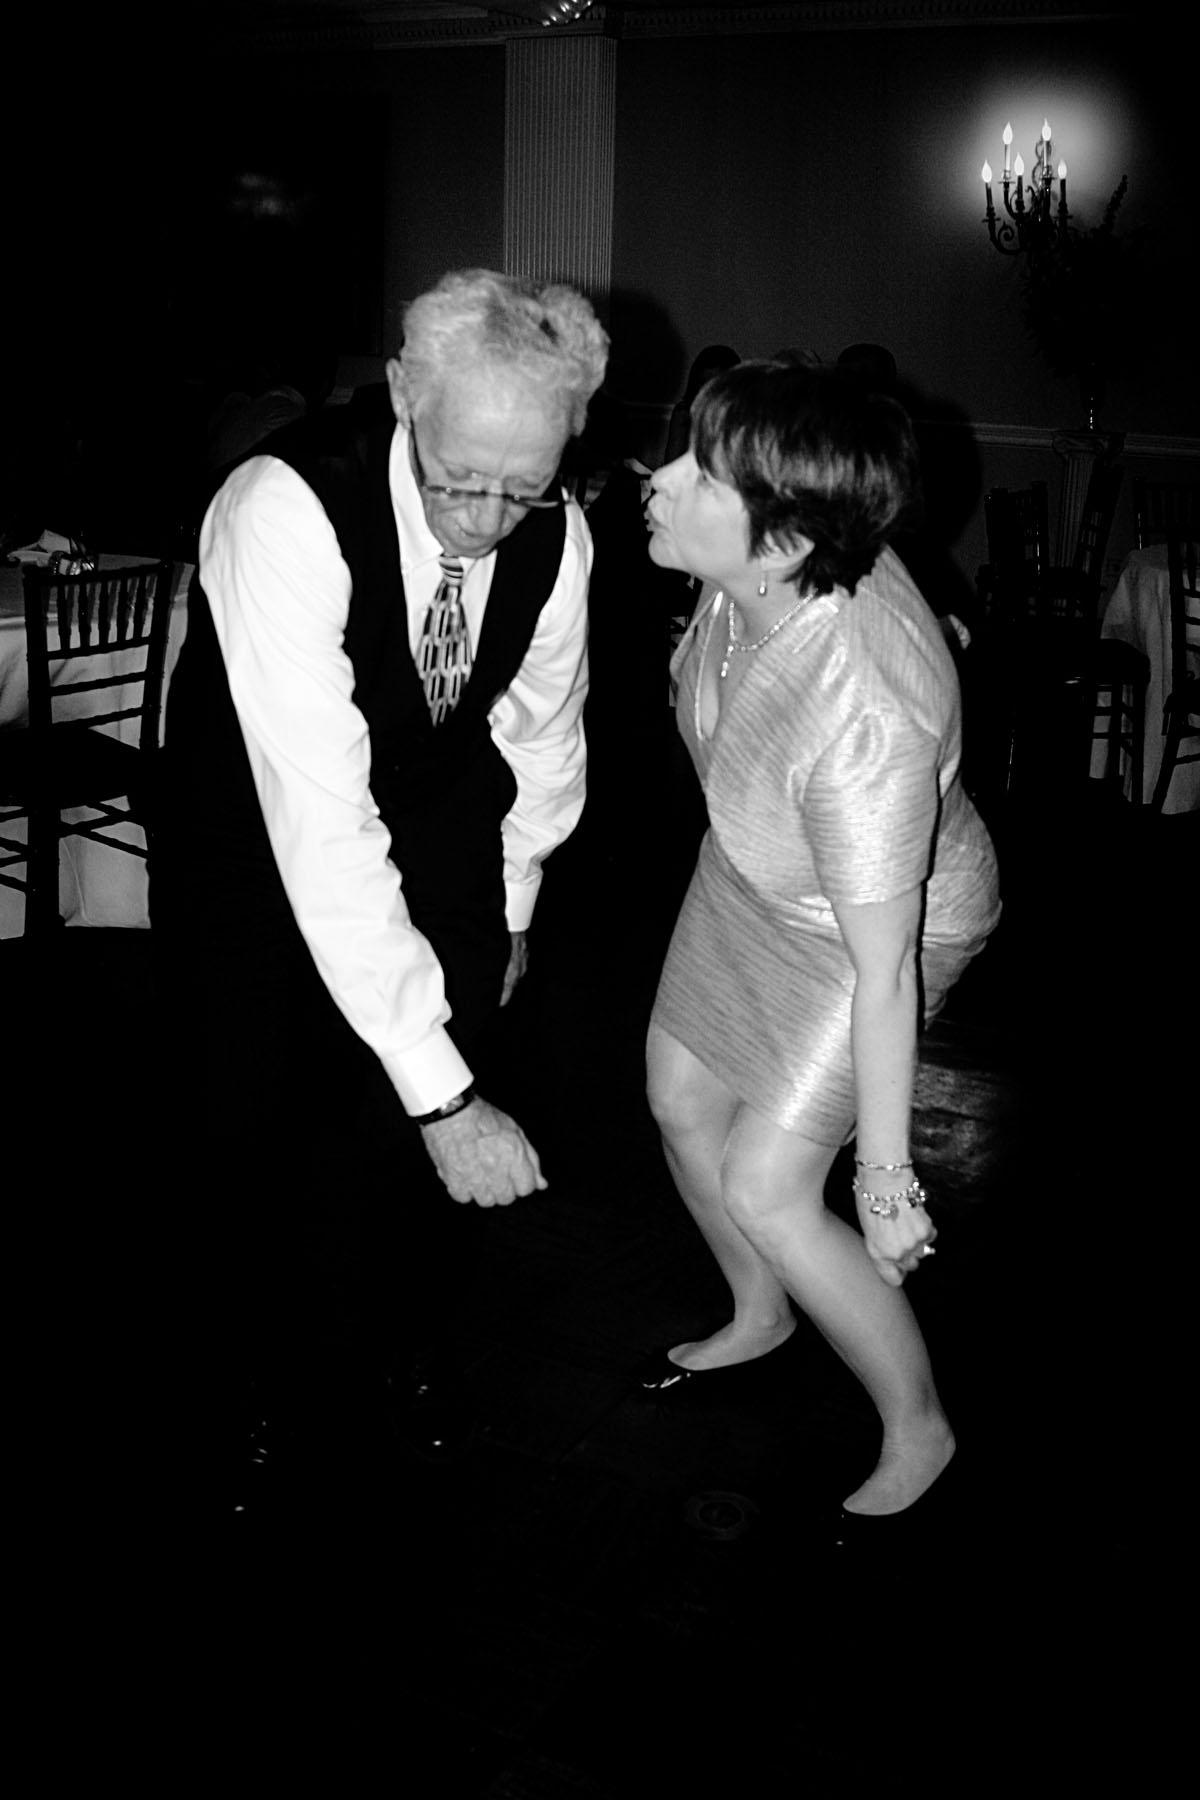 lenny_guest_dancing_bw_2.jpg